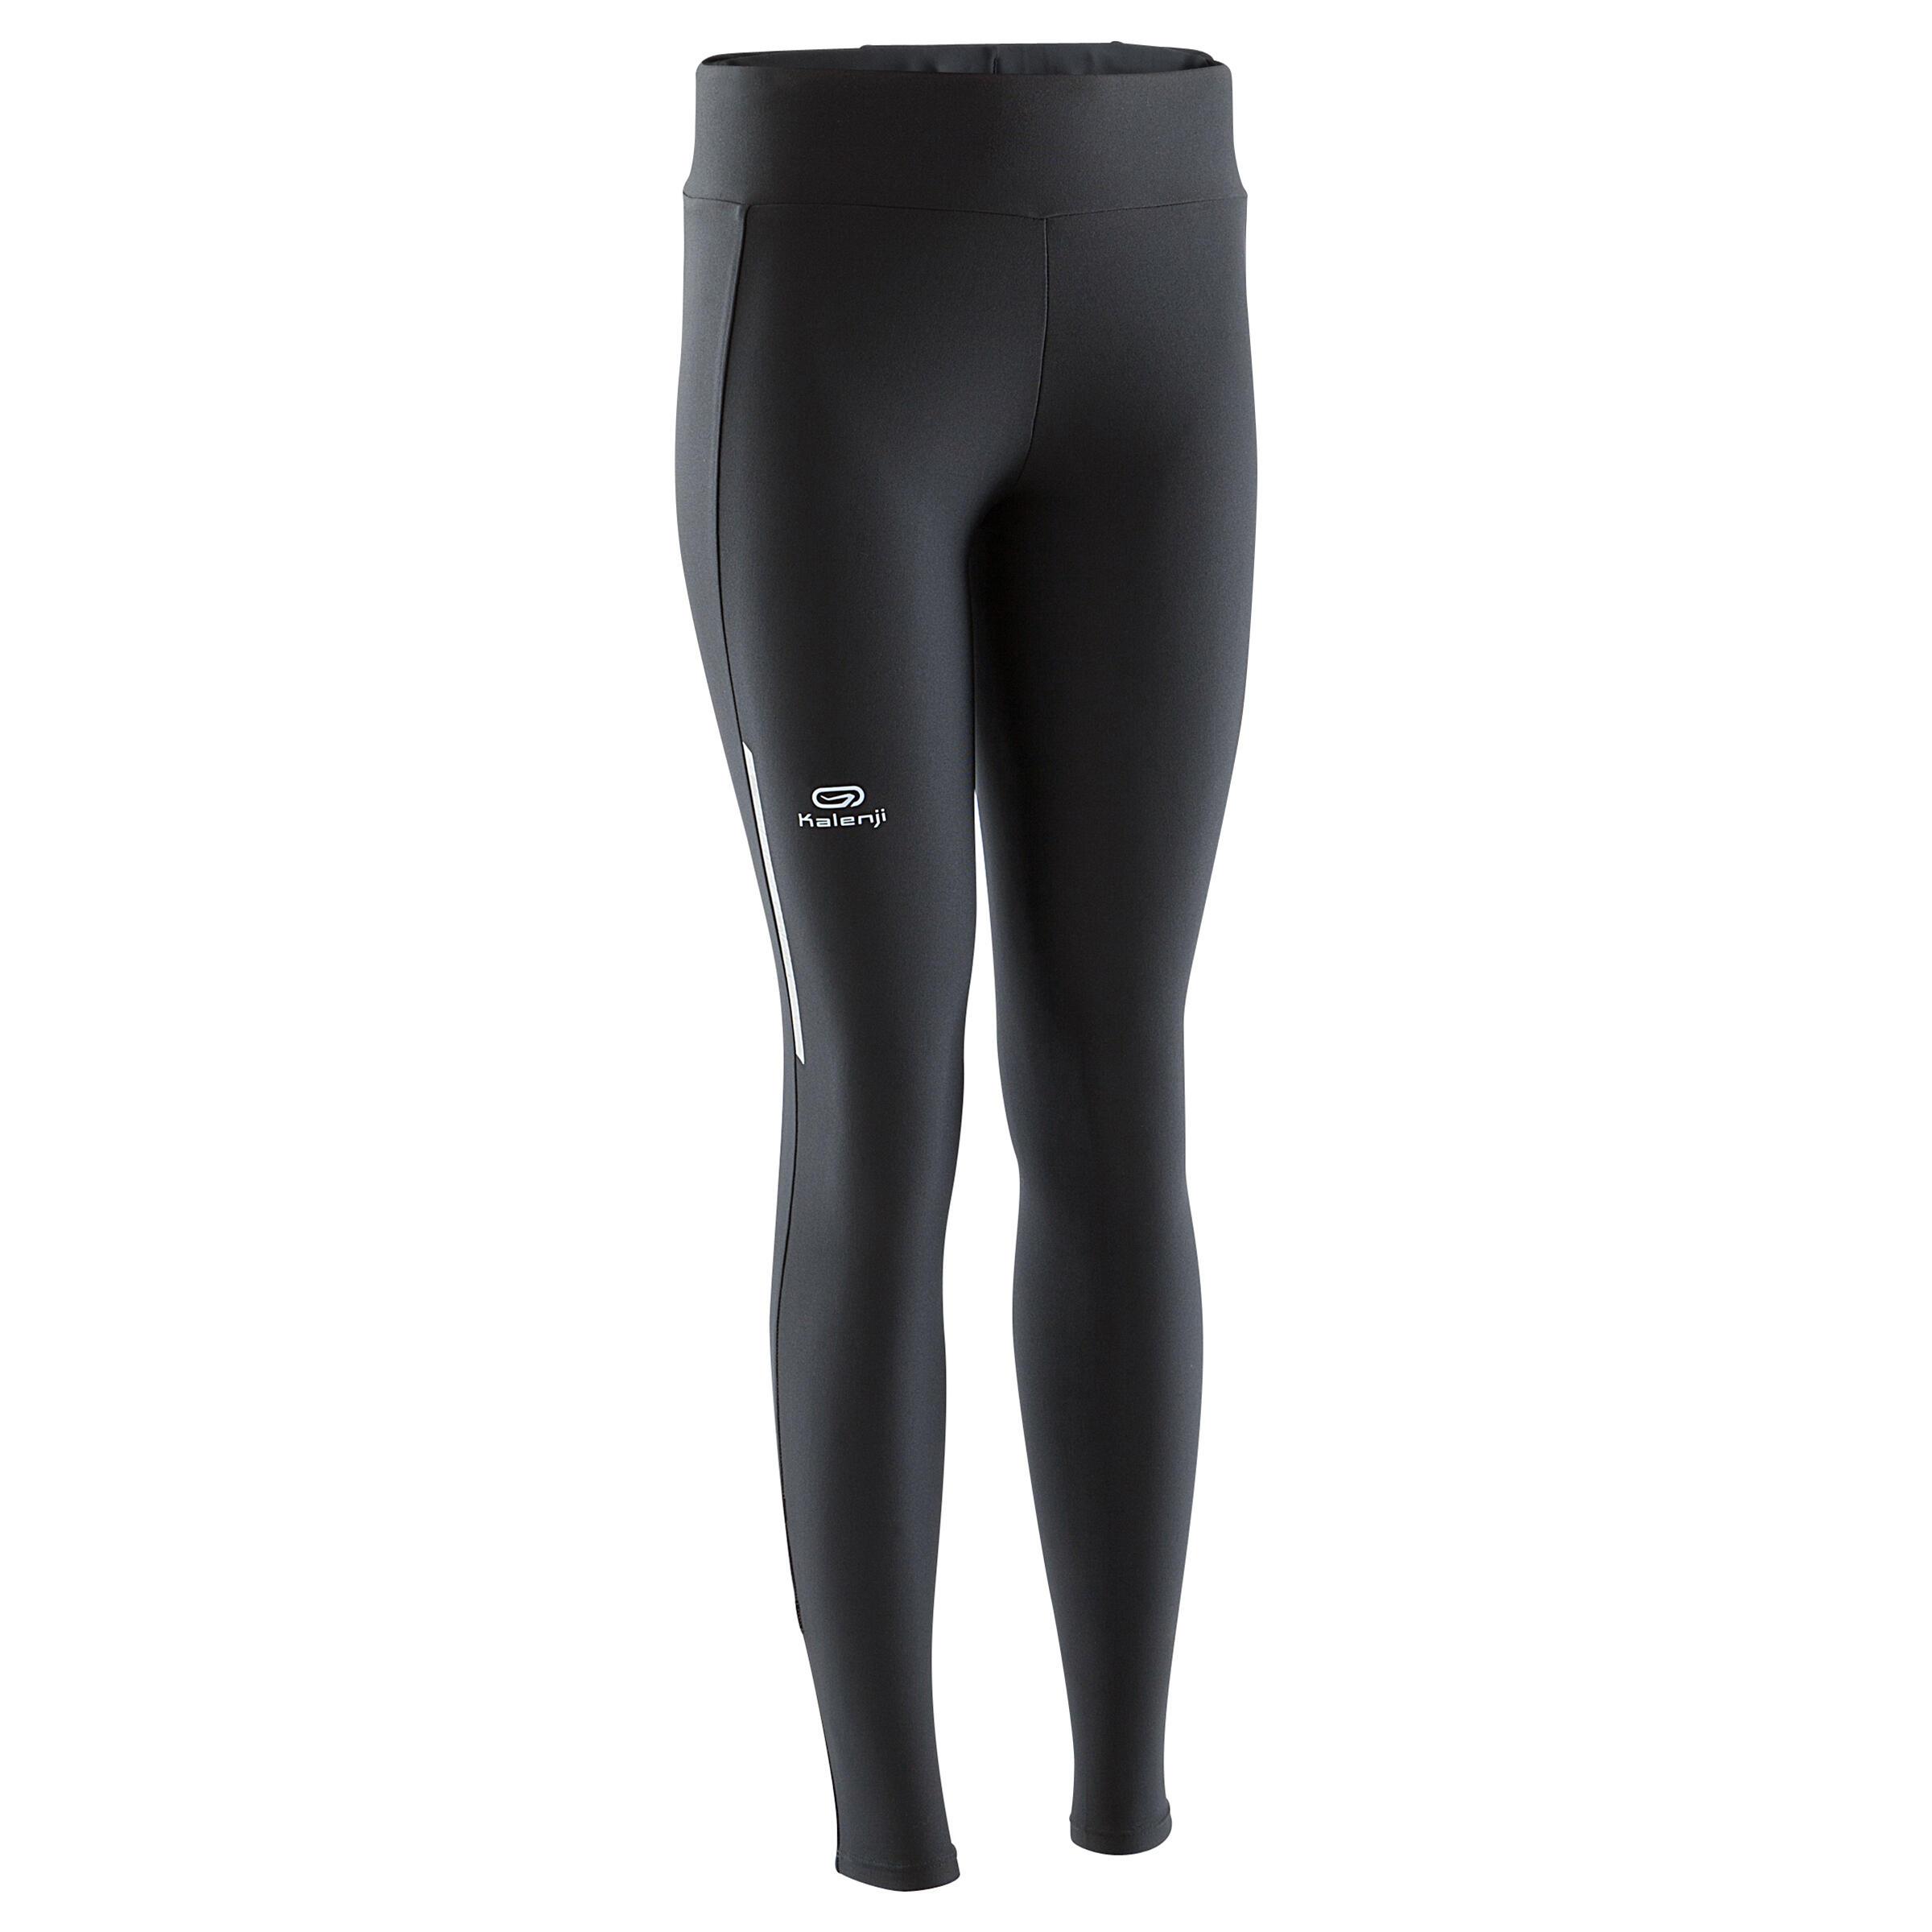 Laufhose lang Tights Run Dry Damen | Sportbekleidung > Sporthosen > Laufhosen | Kalenji